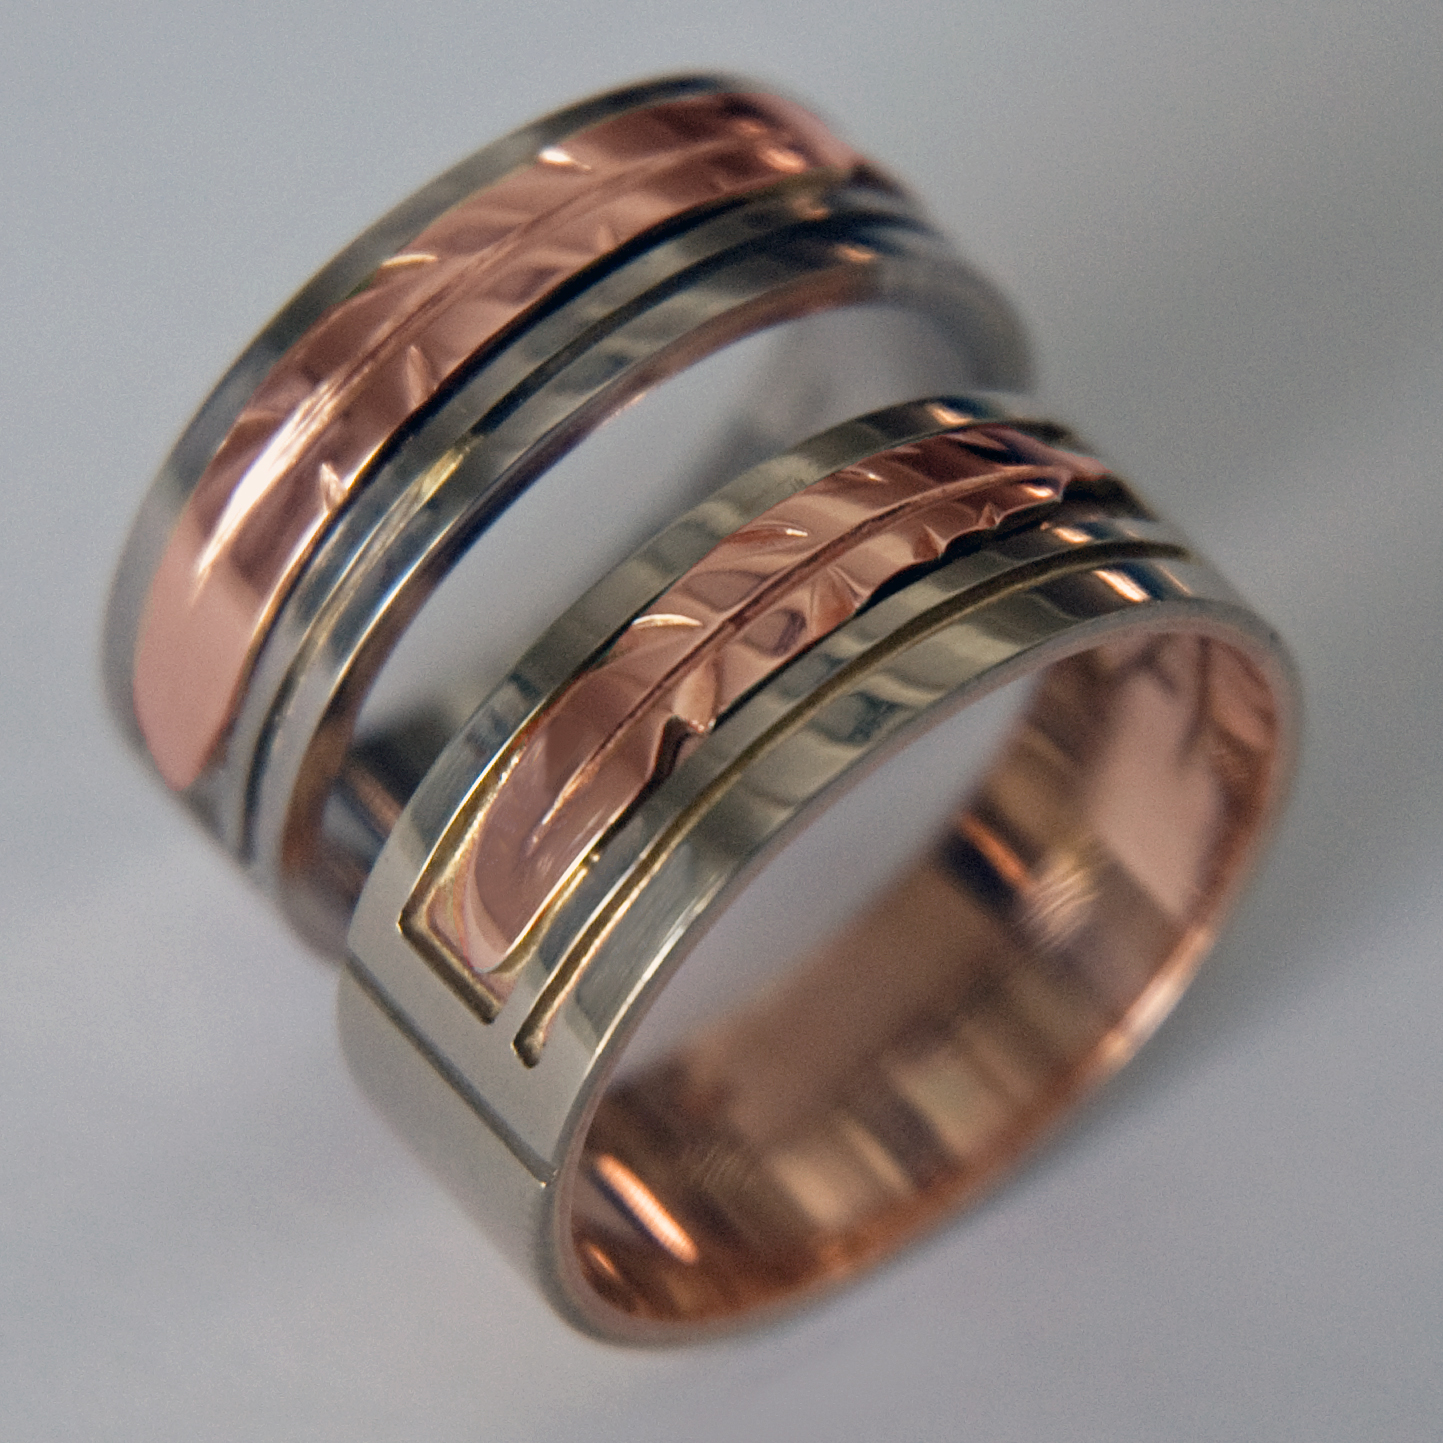 Polished Wedding Rings >: Native American Wedding Ring Designs At Websimilar.org